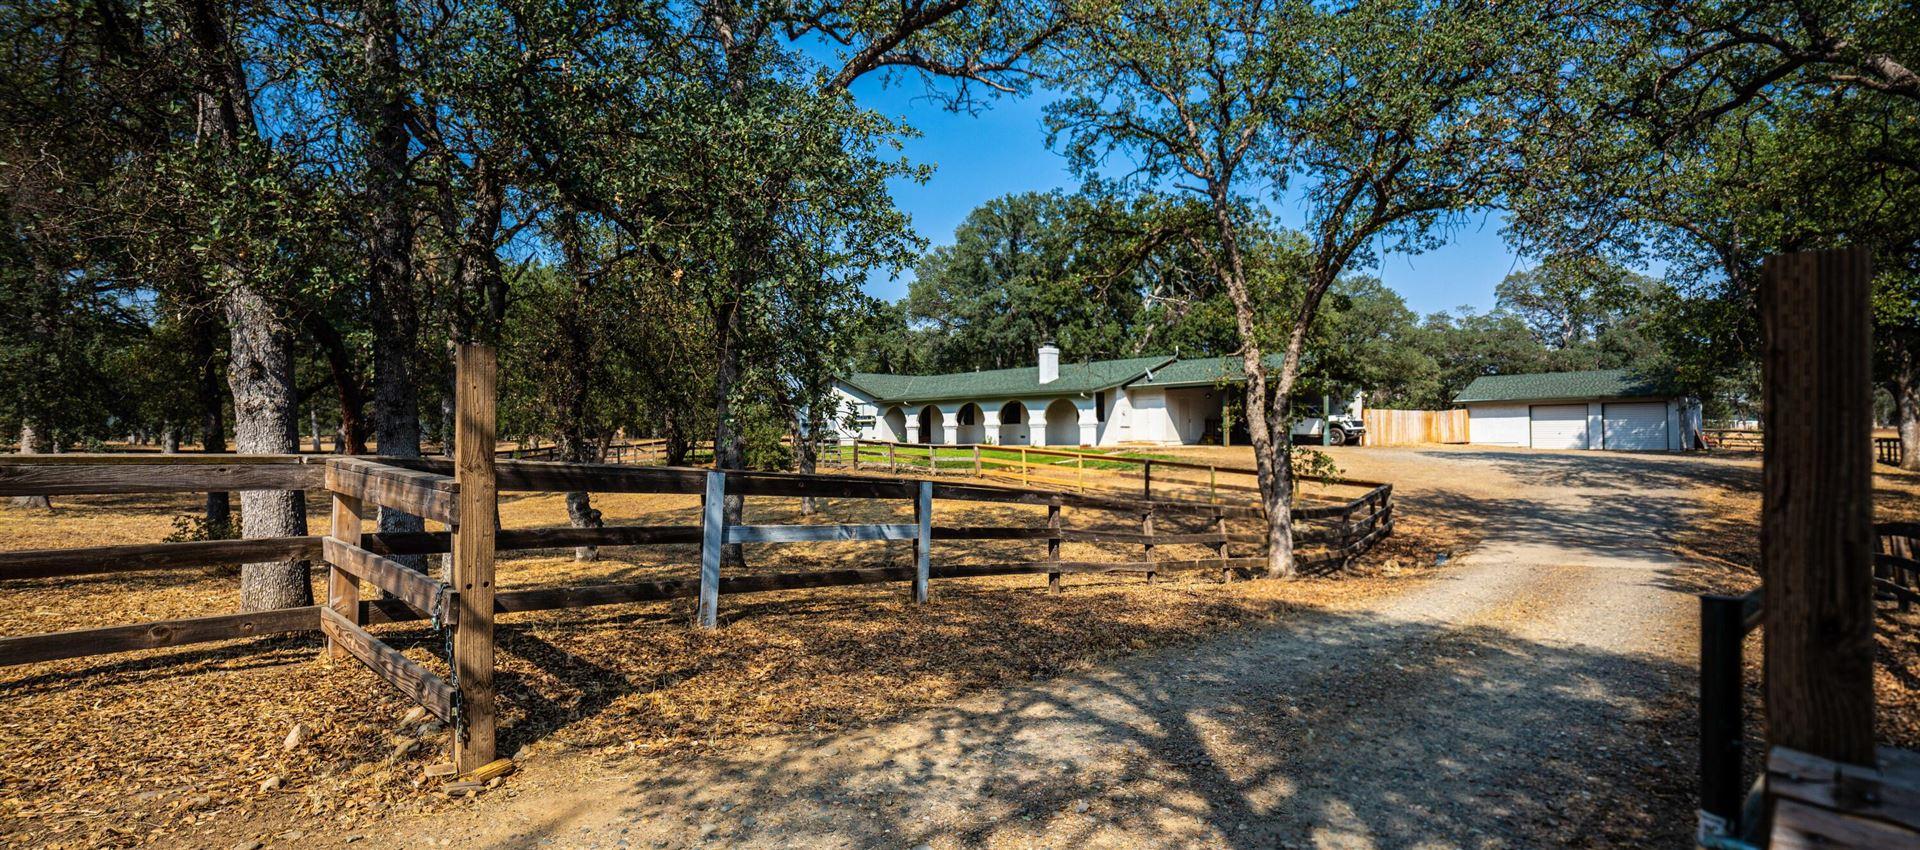 Photo of 3443 Meadow Oak Dr, Cottonwood, CA 96022 (MLS # 21-4190)